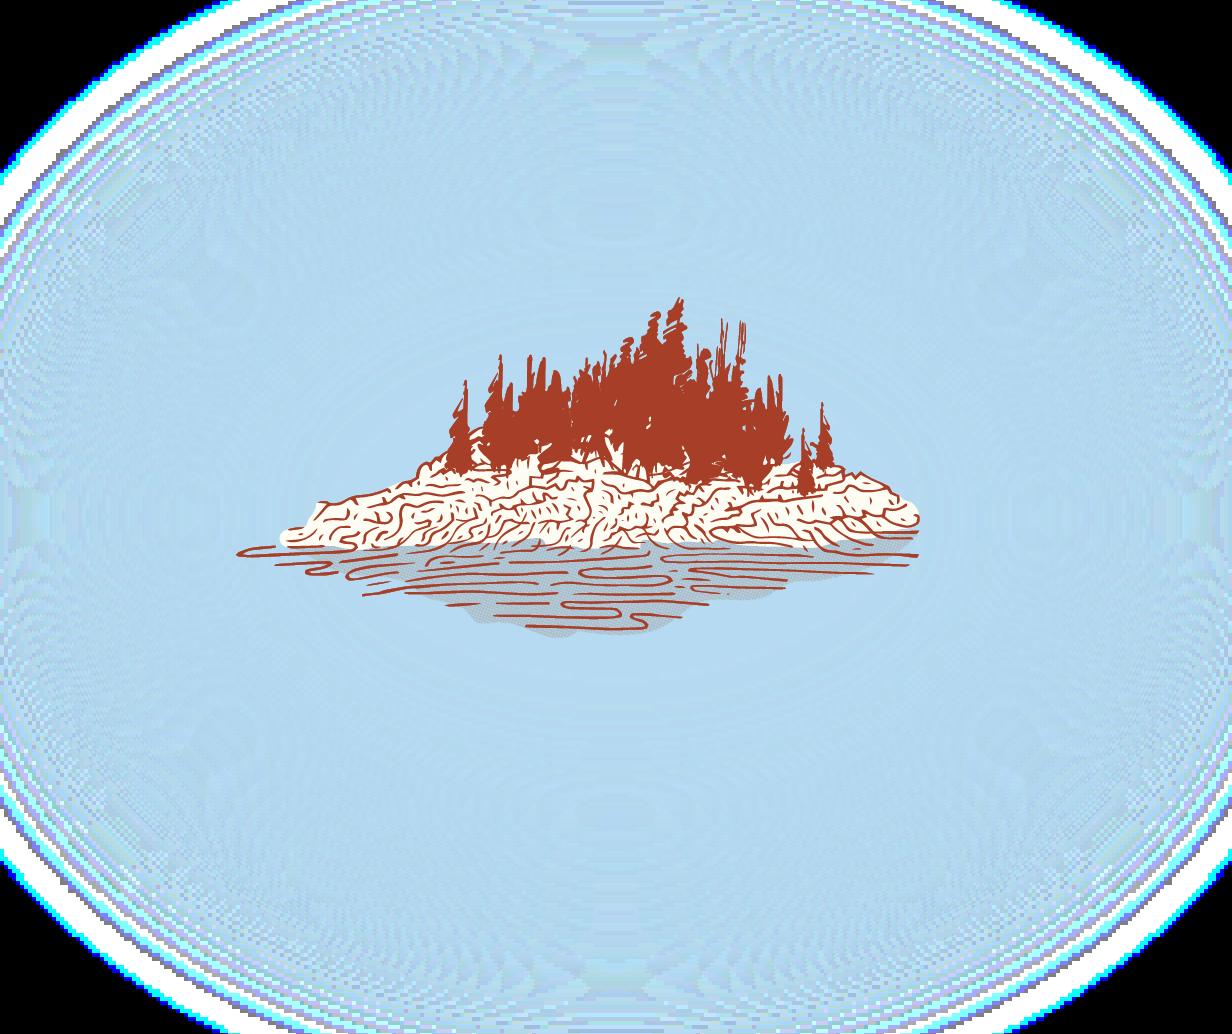 Whaleback Illustration